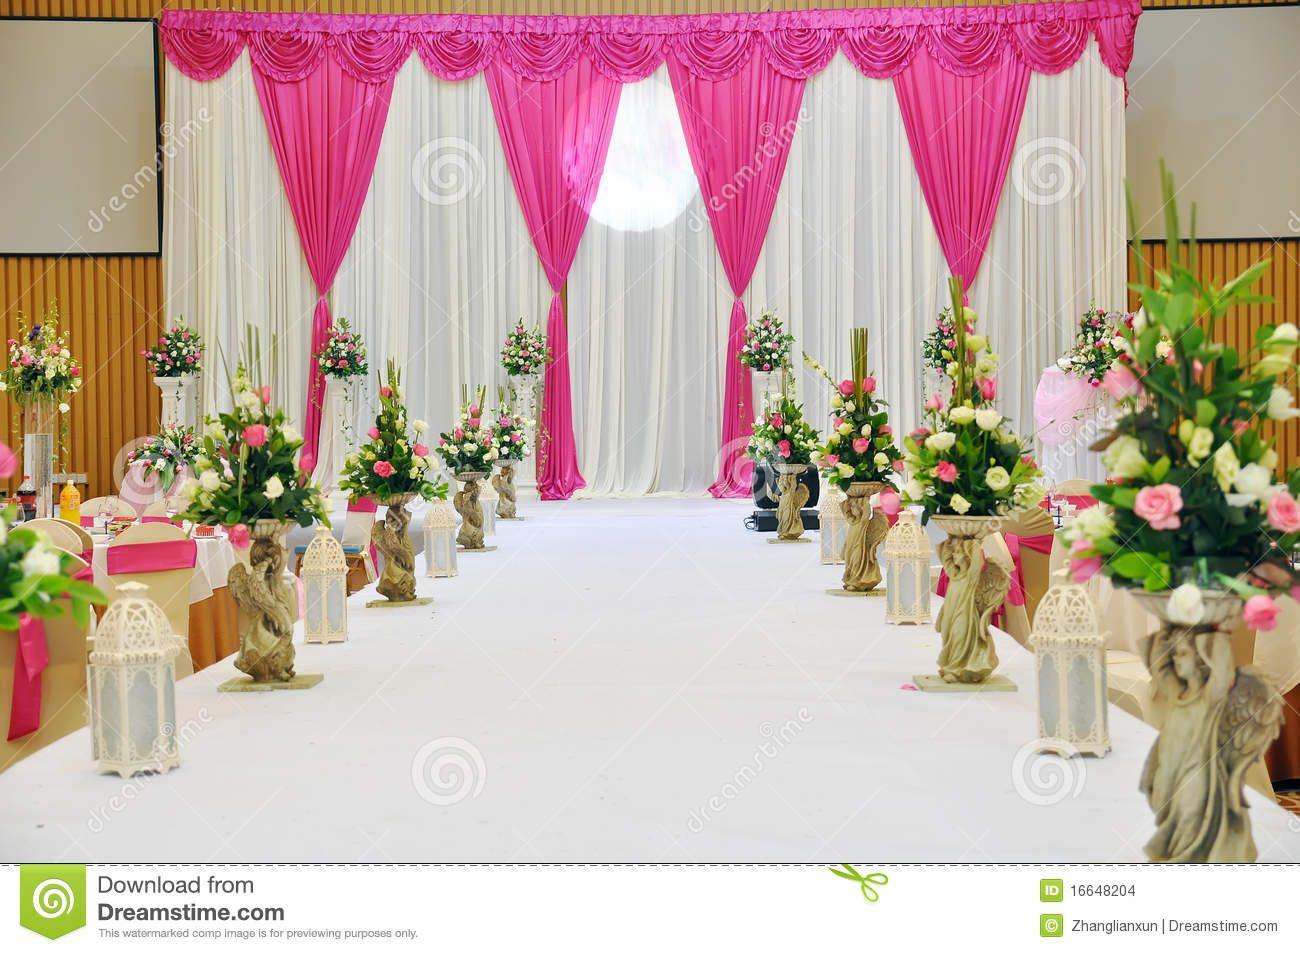 wholesale backdrops weddings - Google Search | bodas brillantes ...